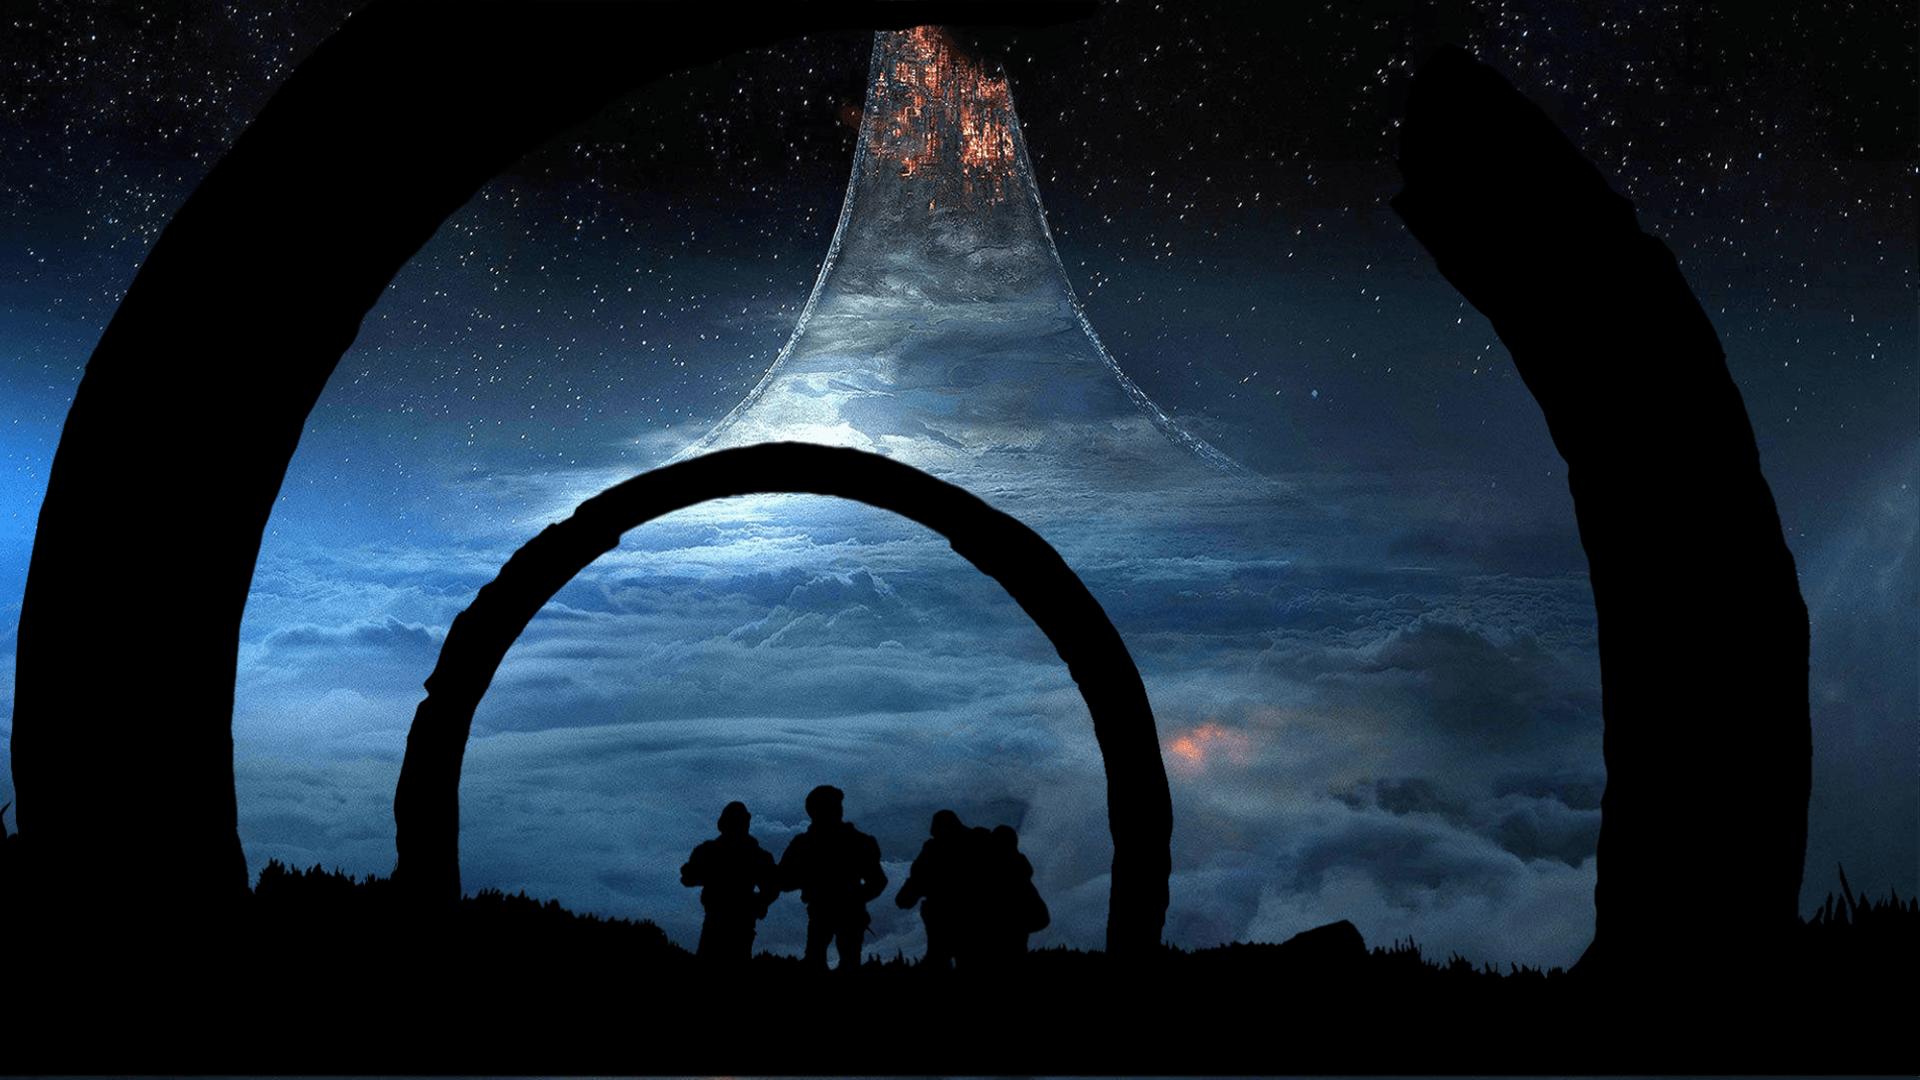 Halo Infinite 4k Wallpapers Top Free Halo Infinite 4k